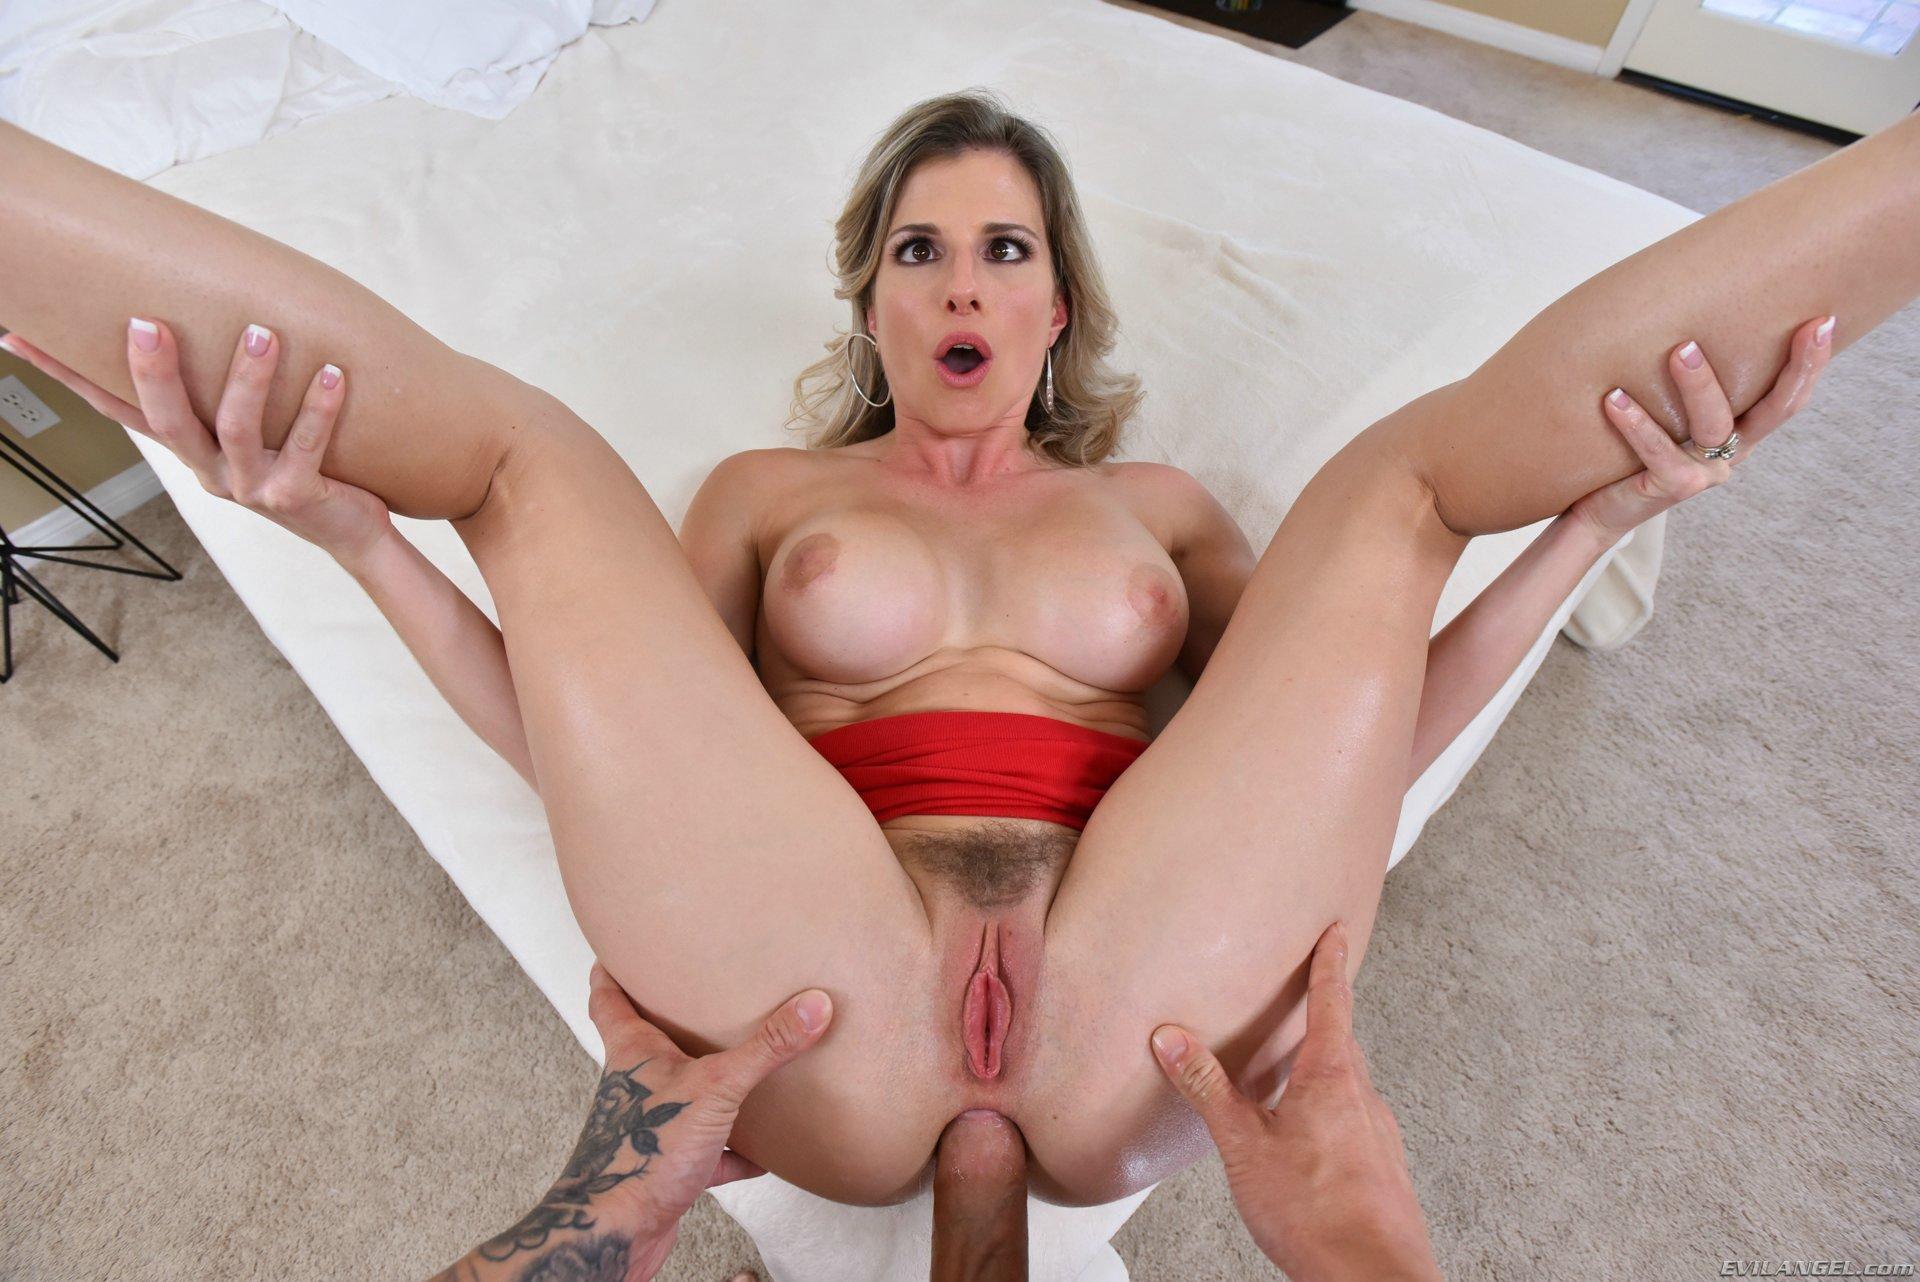 Cory chase anal porn